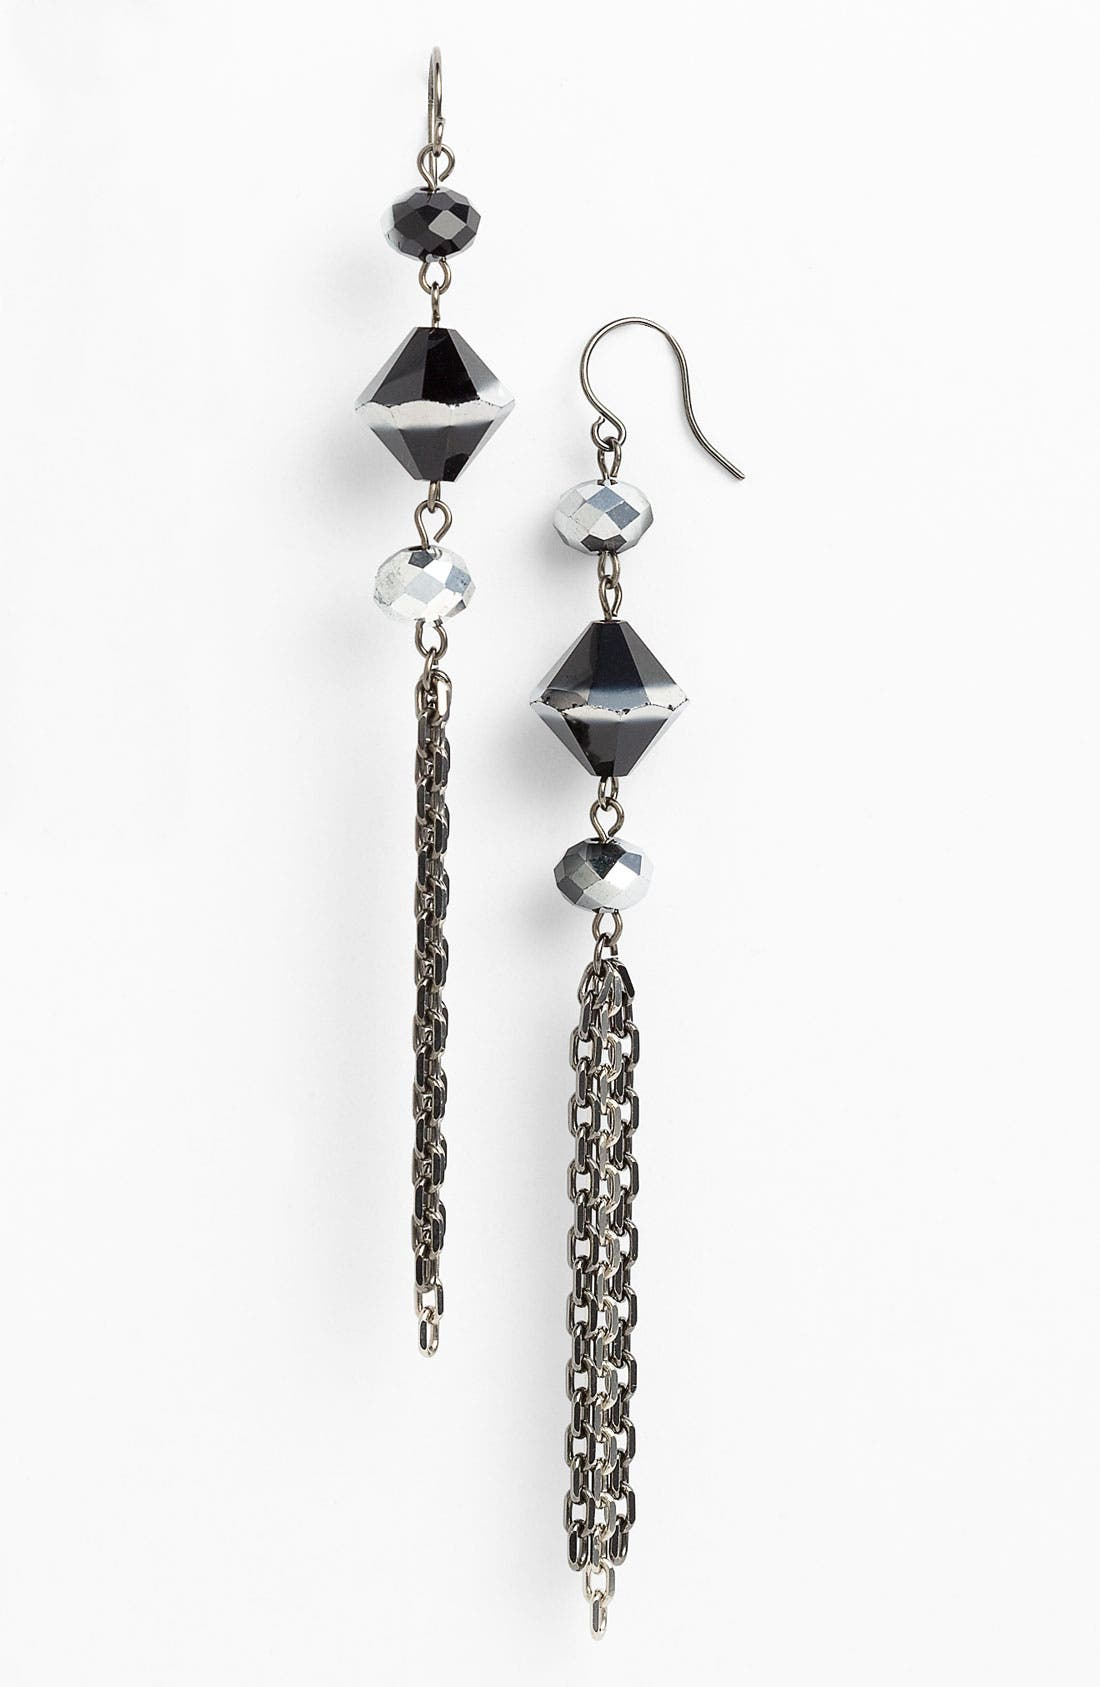 Alternate Image 1 Selected - Nordstrom 'Wisteria' Linear Earrings